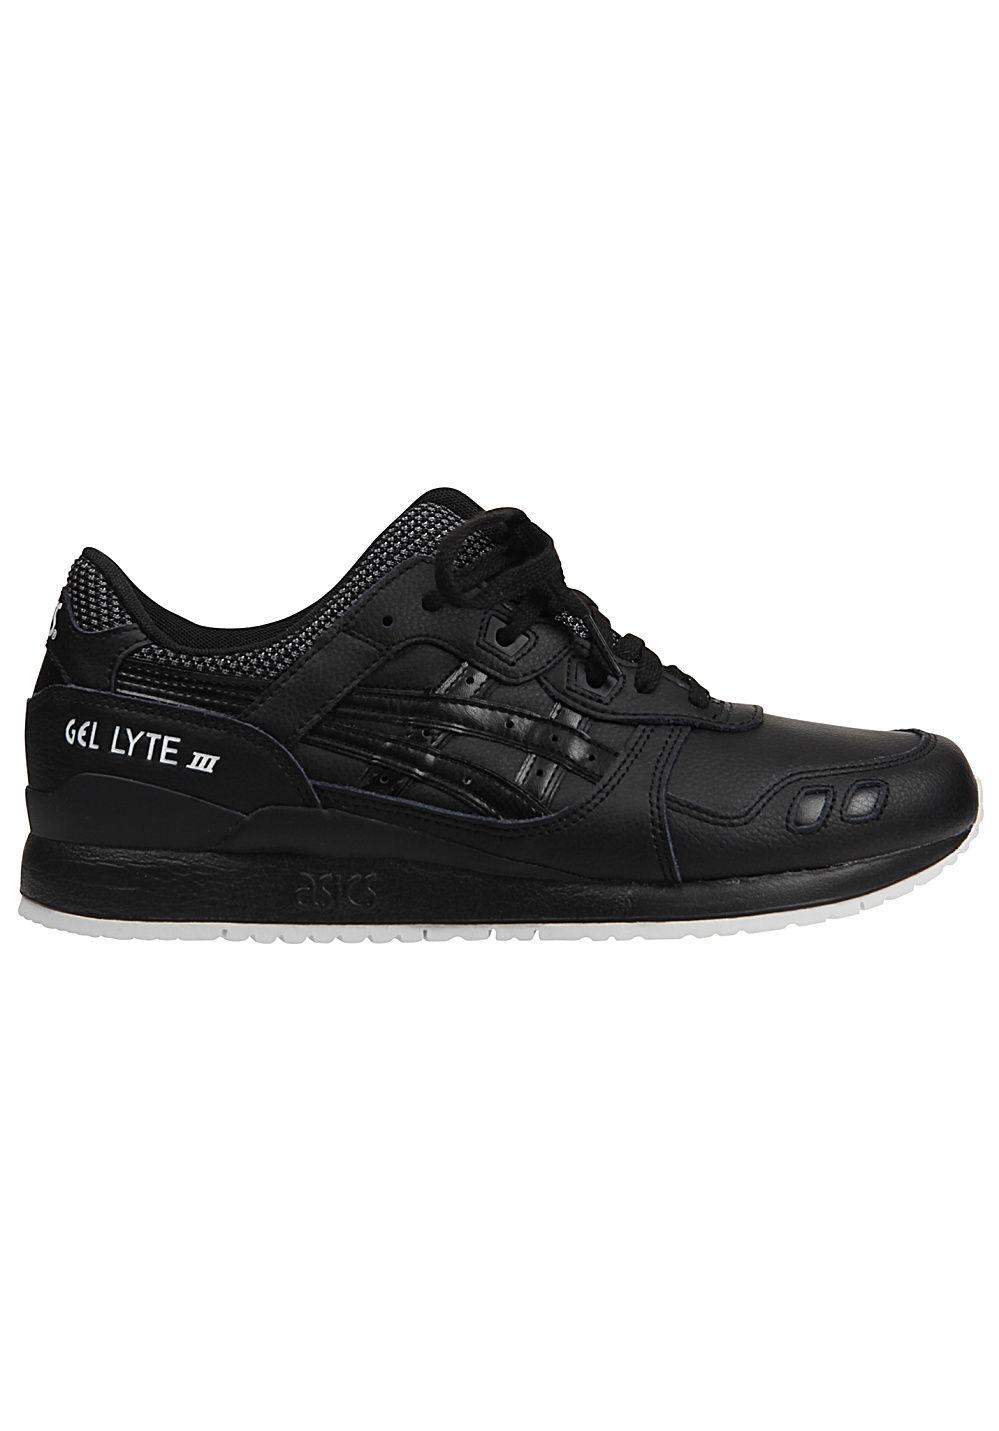 100% authentic 4c047 bf7b2 Asics Tiger Gel-Lyte III - Baskets pour Homme - Noir